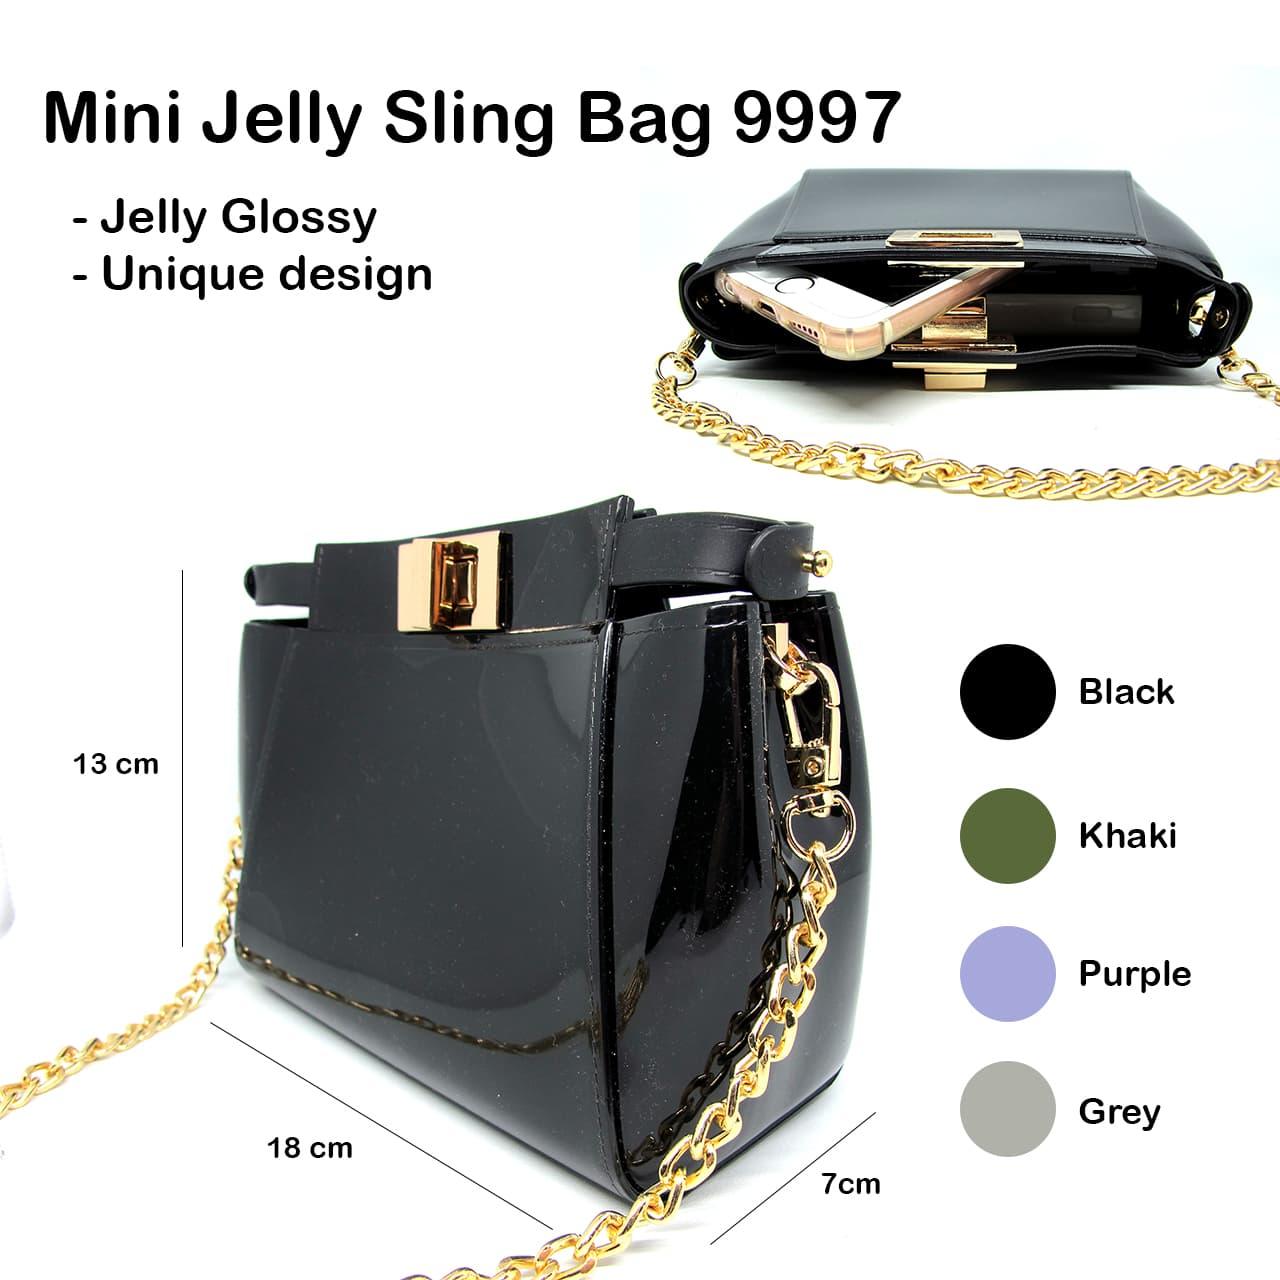 Jual Jm9997 Tas Jelly Matte Mini 18 Cm Selempang Sling Wanita Import ... dde86dee89